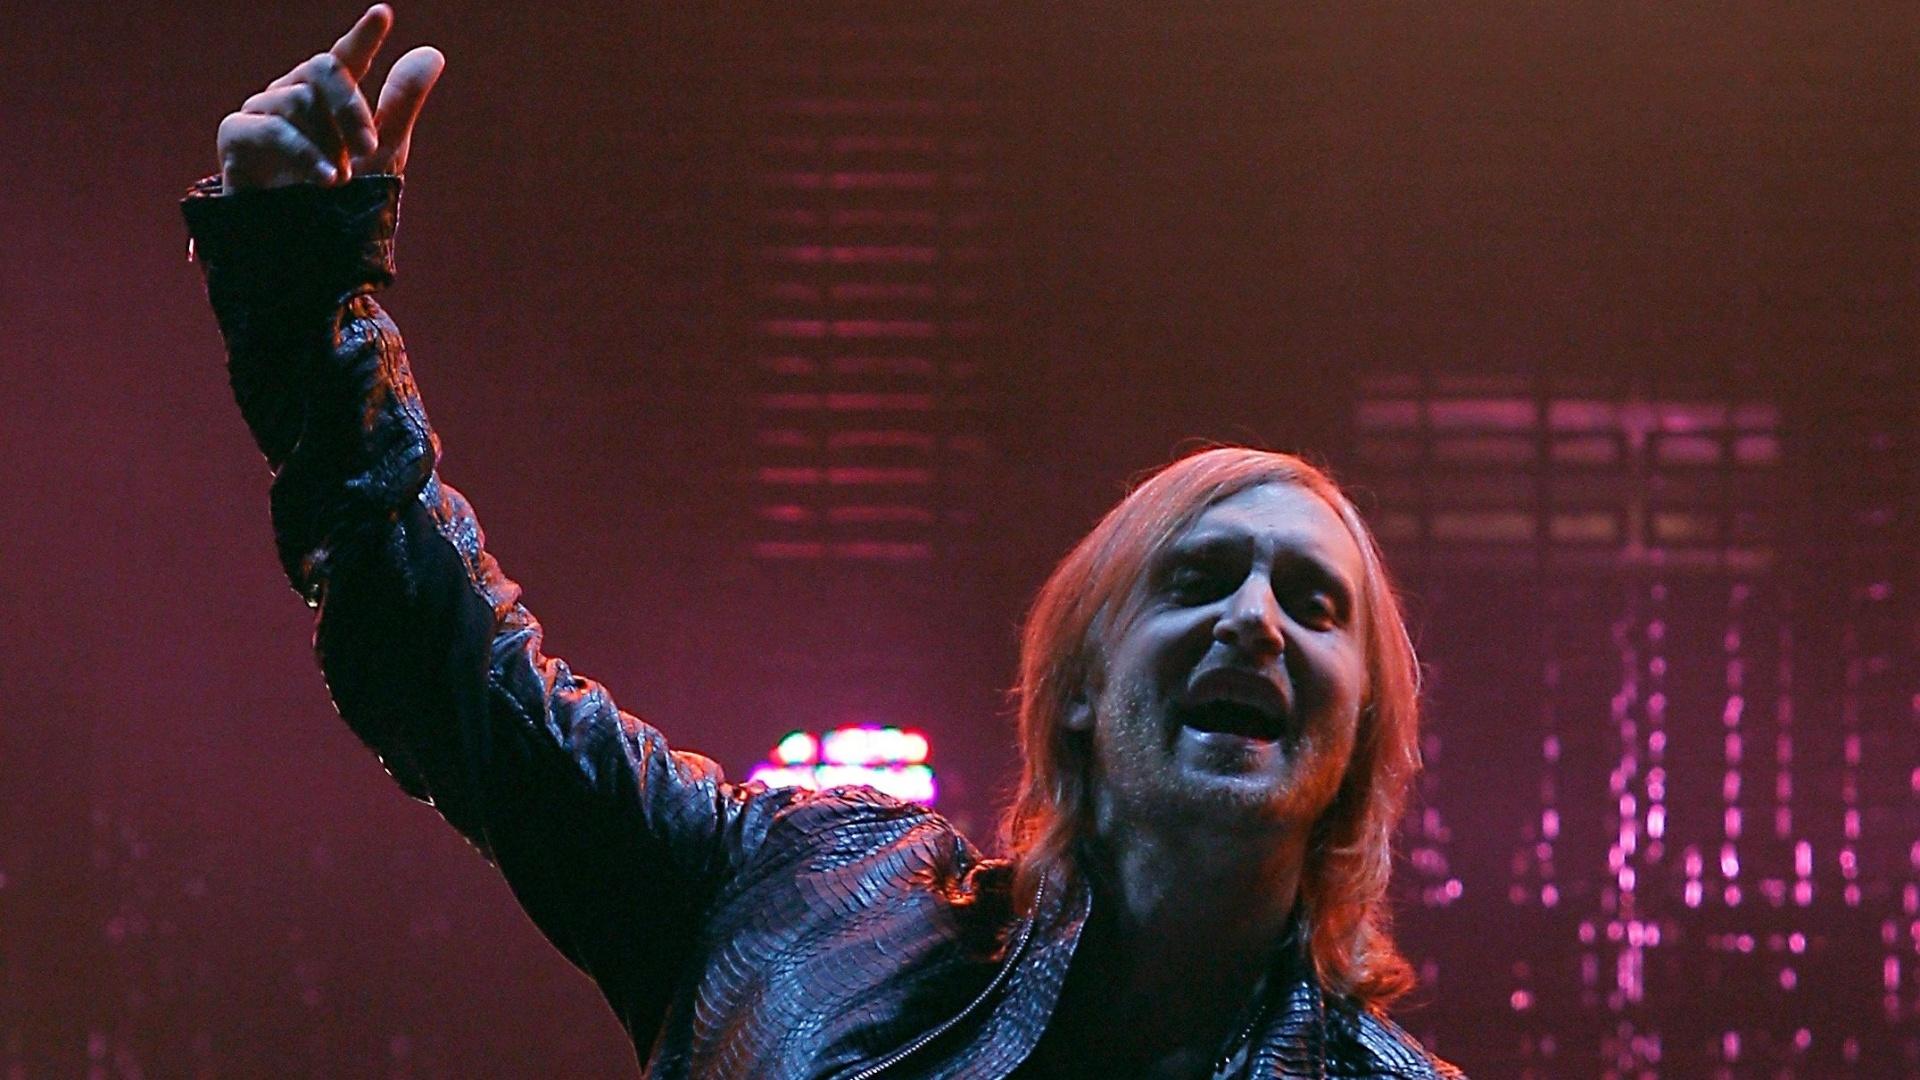 O DJ francês David Guetta se apresenta no Rock In Rio Madri, na Espanha (6/7/12)